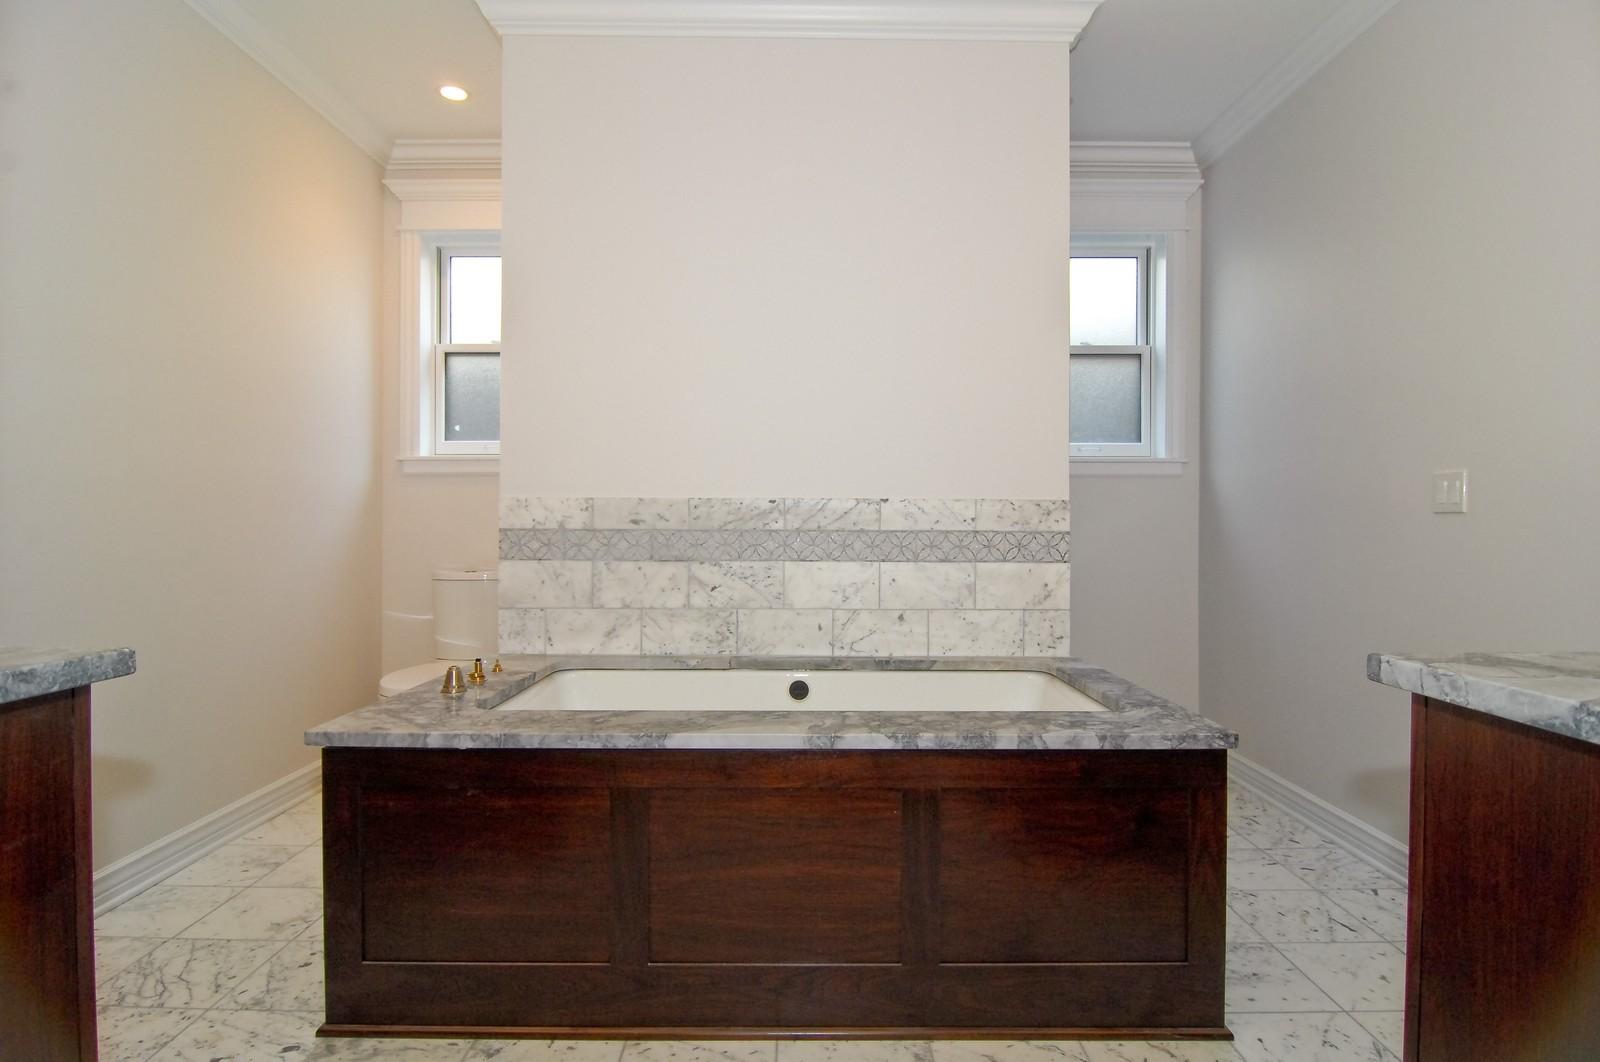 Real Estate Photography - 1845 W. Newport, Chicago, IL, 60657 - Master Bathroom